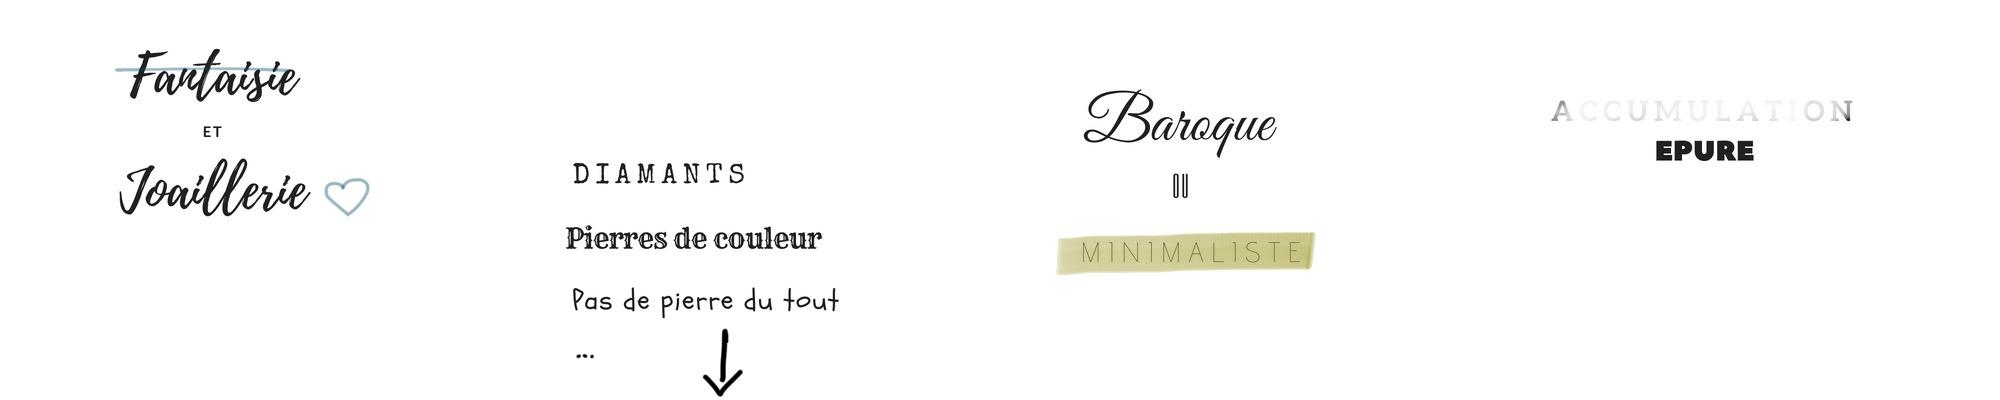 Joaillerie minimaliste épure diamant.jpg